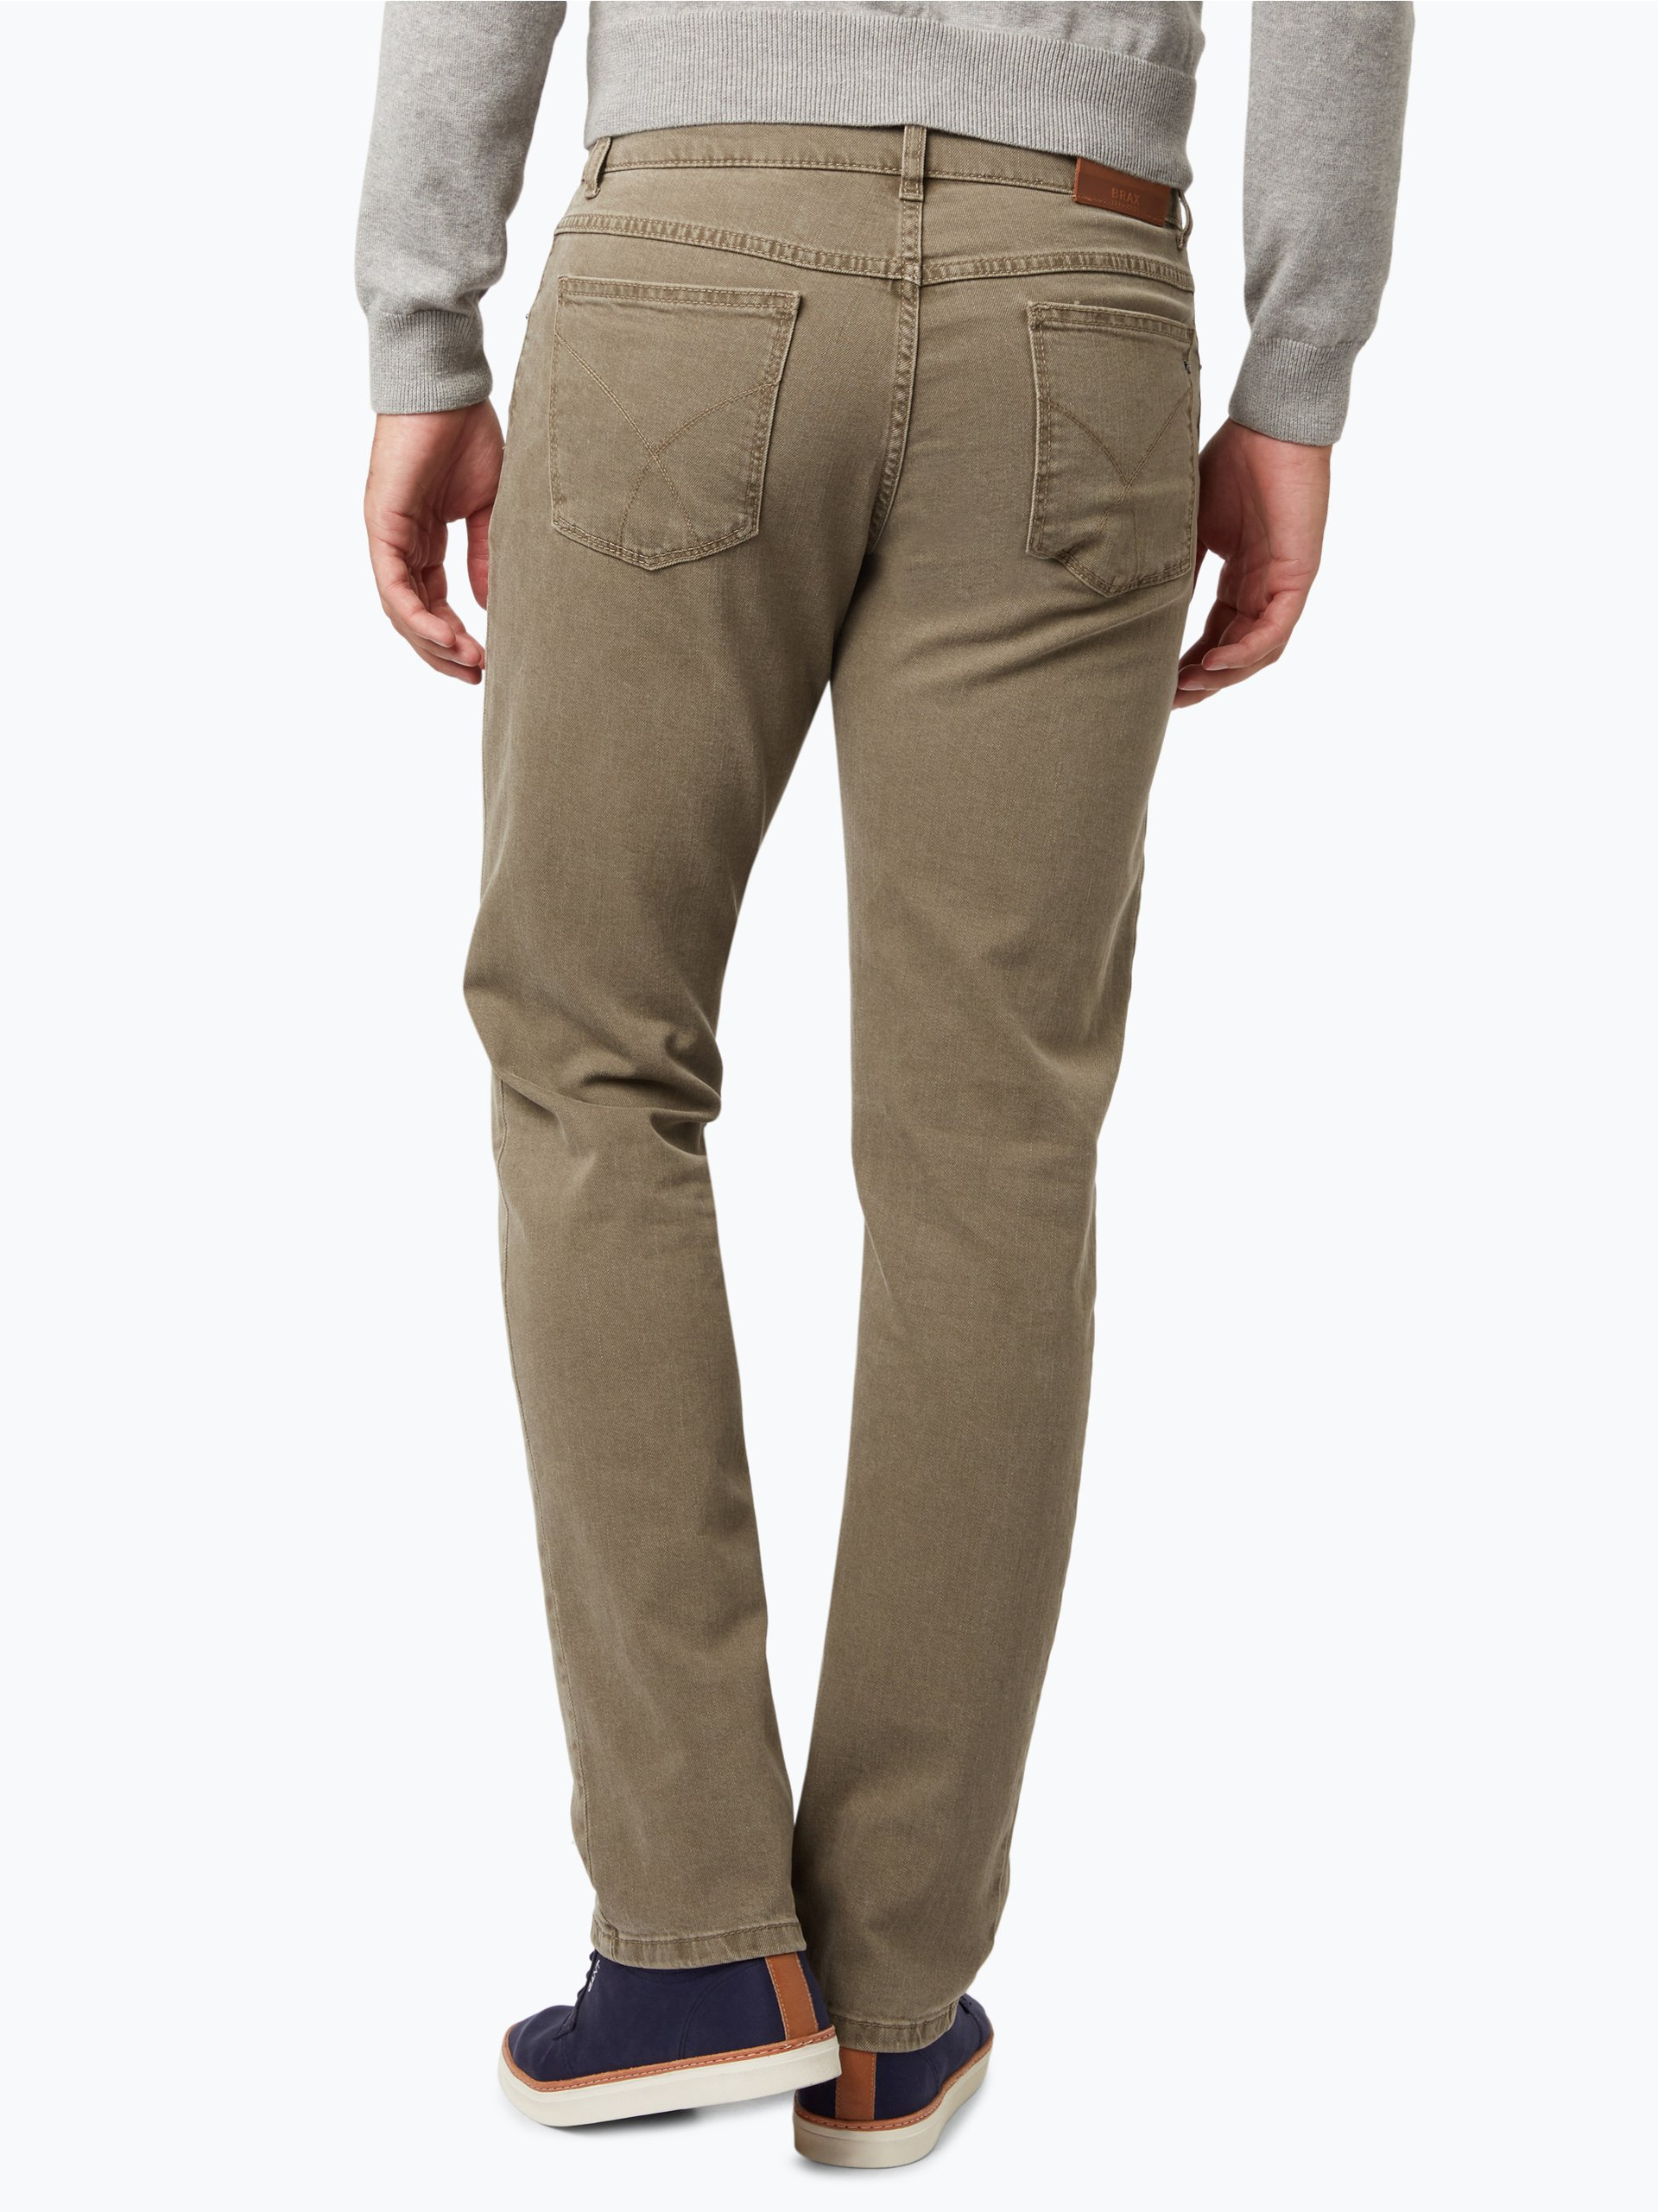 brax herren jeans cooper sand uni online kaufen. Black Bedroom Furniture Sets. Home Design Ideas